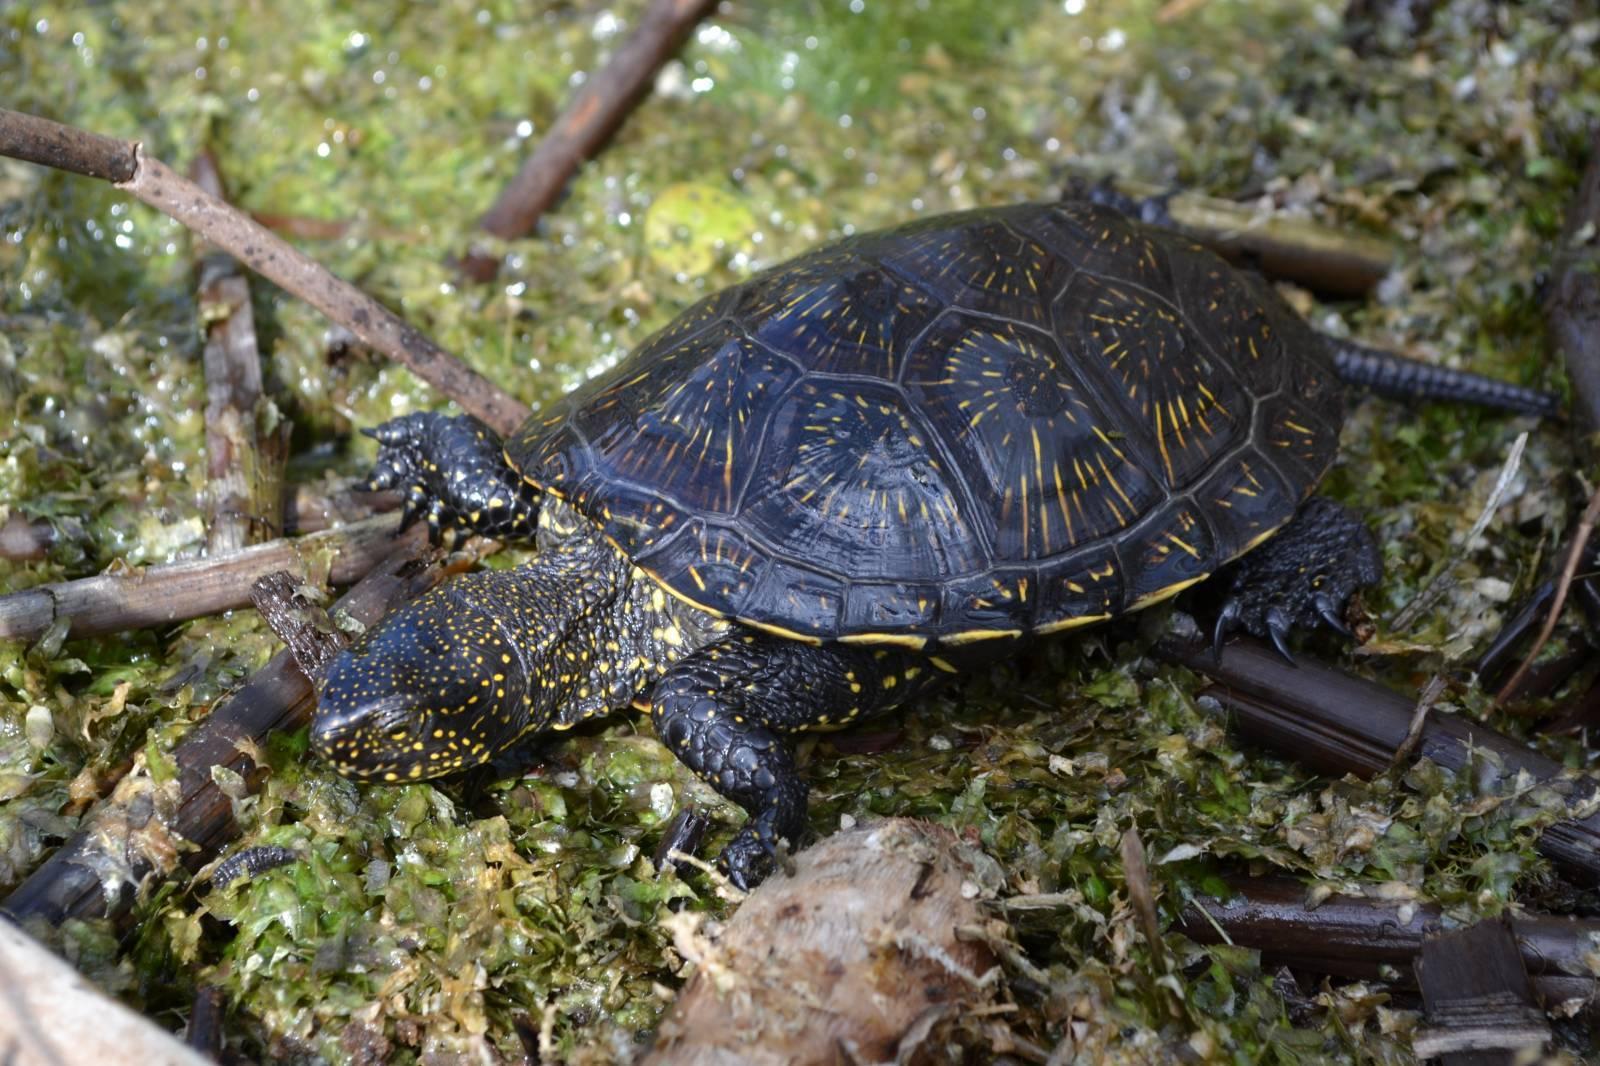 Водная черепаха - виды, описание, пища и места обитания (120 фото + видео)